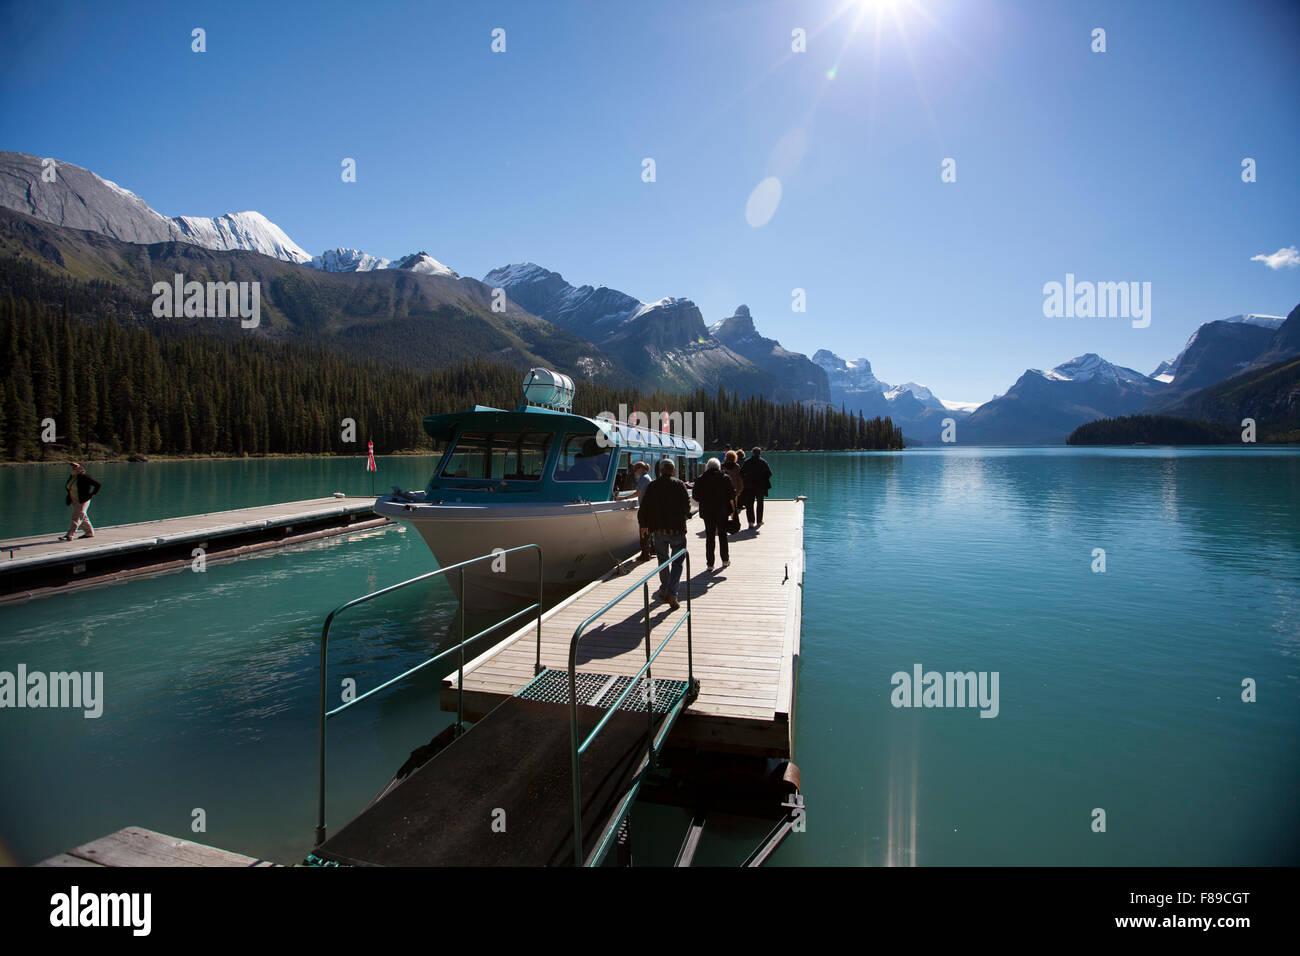 JASPER, ALBERTA - SEPTEMBER 6, 2012: Tourists depart on a chartered boat tour of Maligne Lake in Jasper National - Stock Image